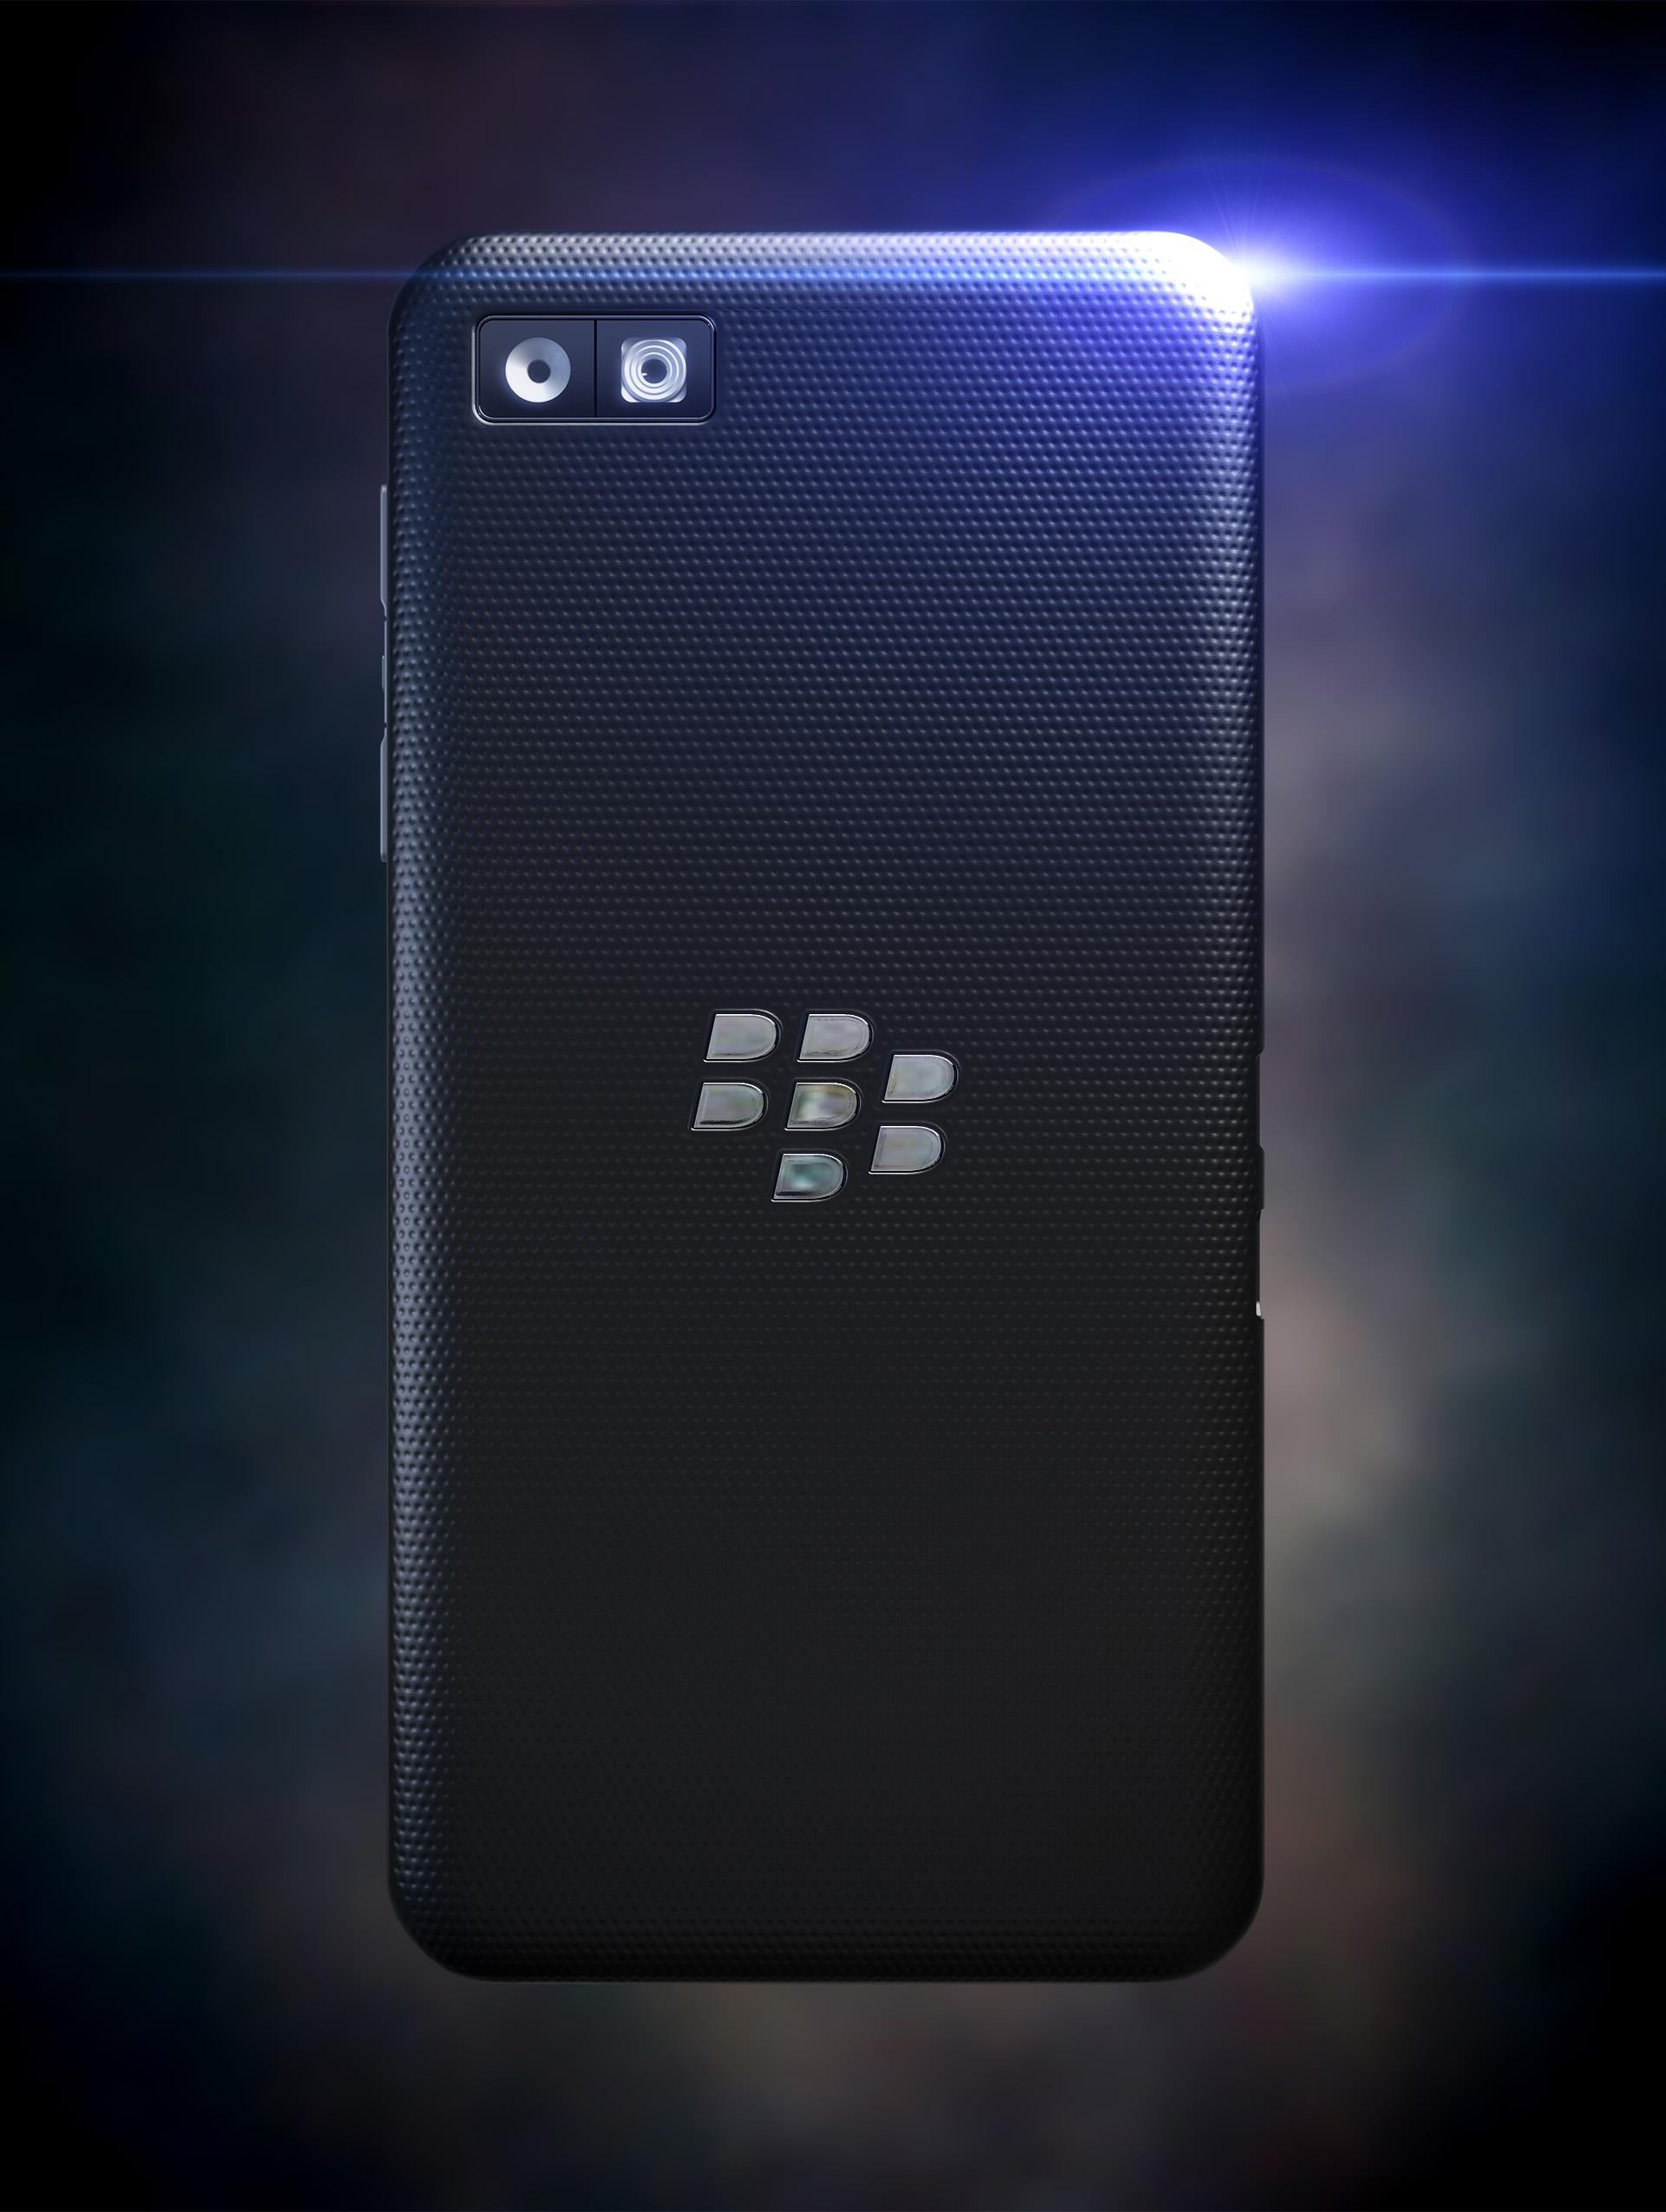 blackberry_bb10_prints_image02